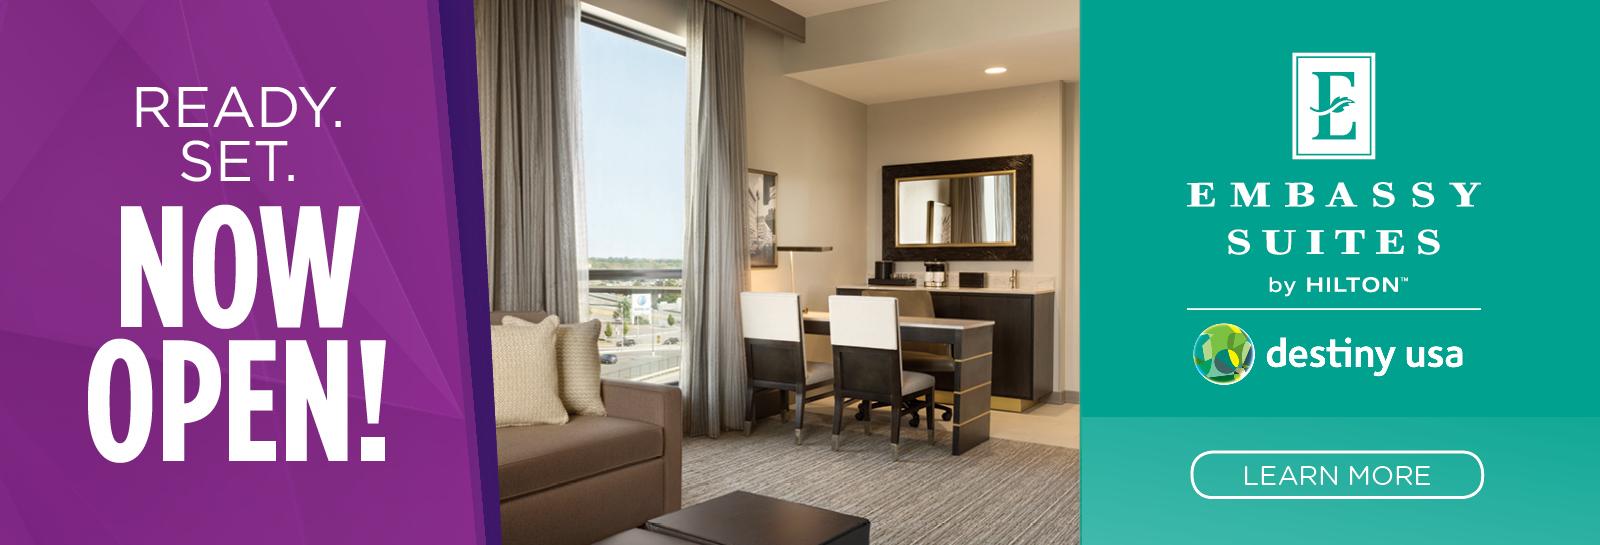 Hotel-HomepageSlider-1600x545